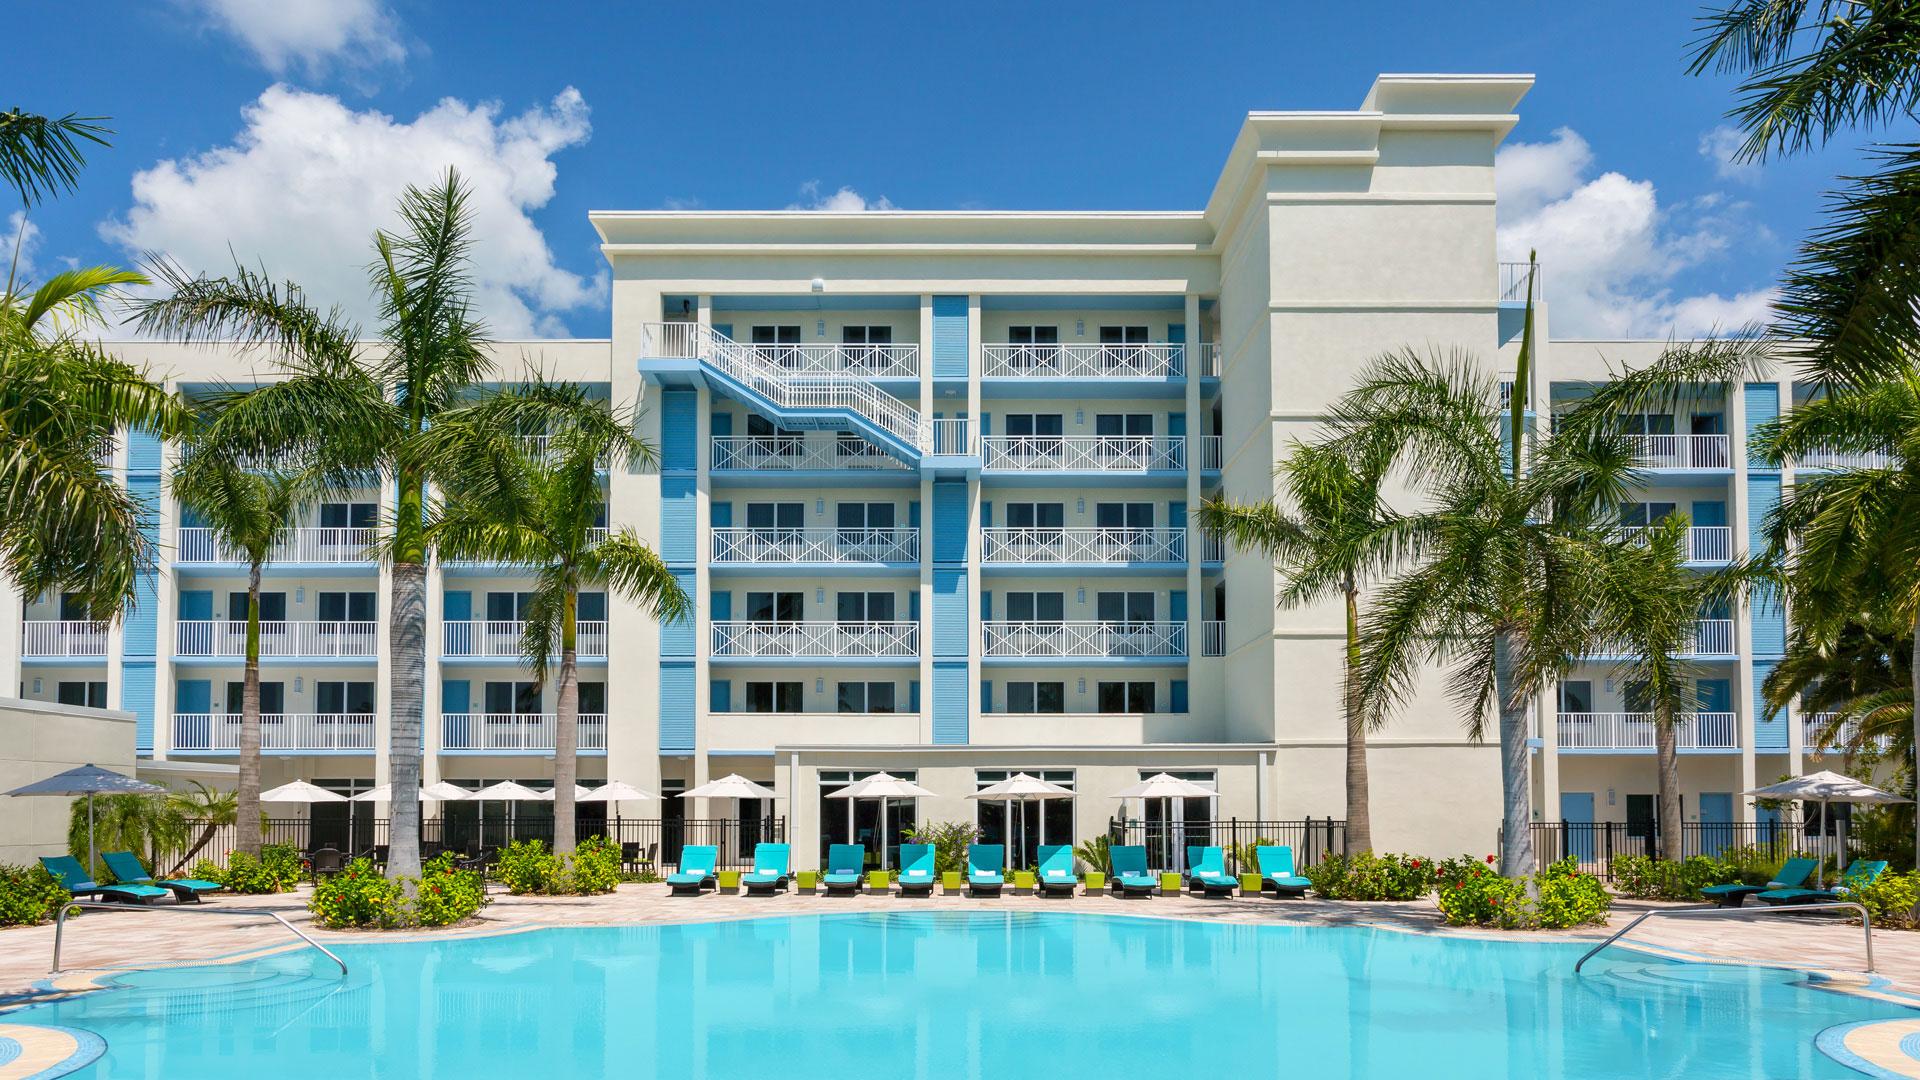 Cayo Hueso y Habana Historeum Key West